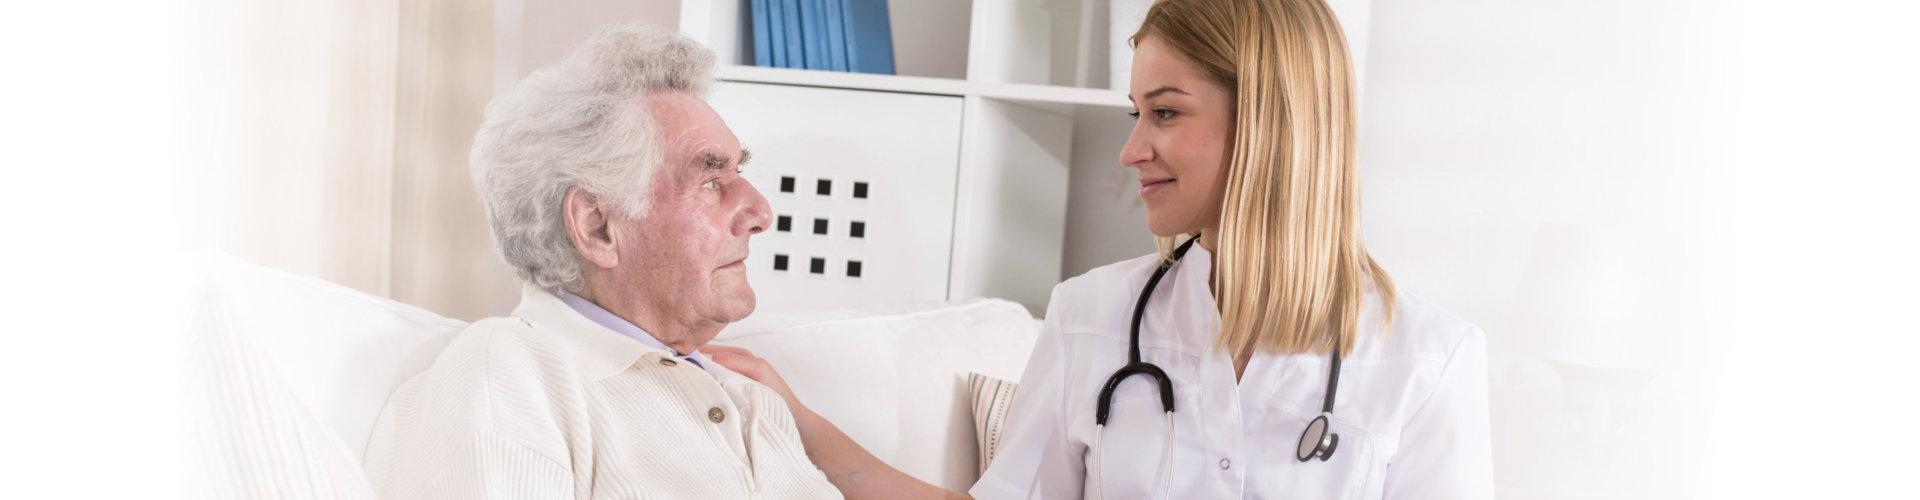 doctor consulting senior man